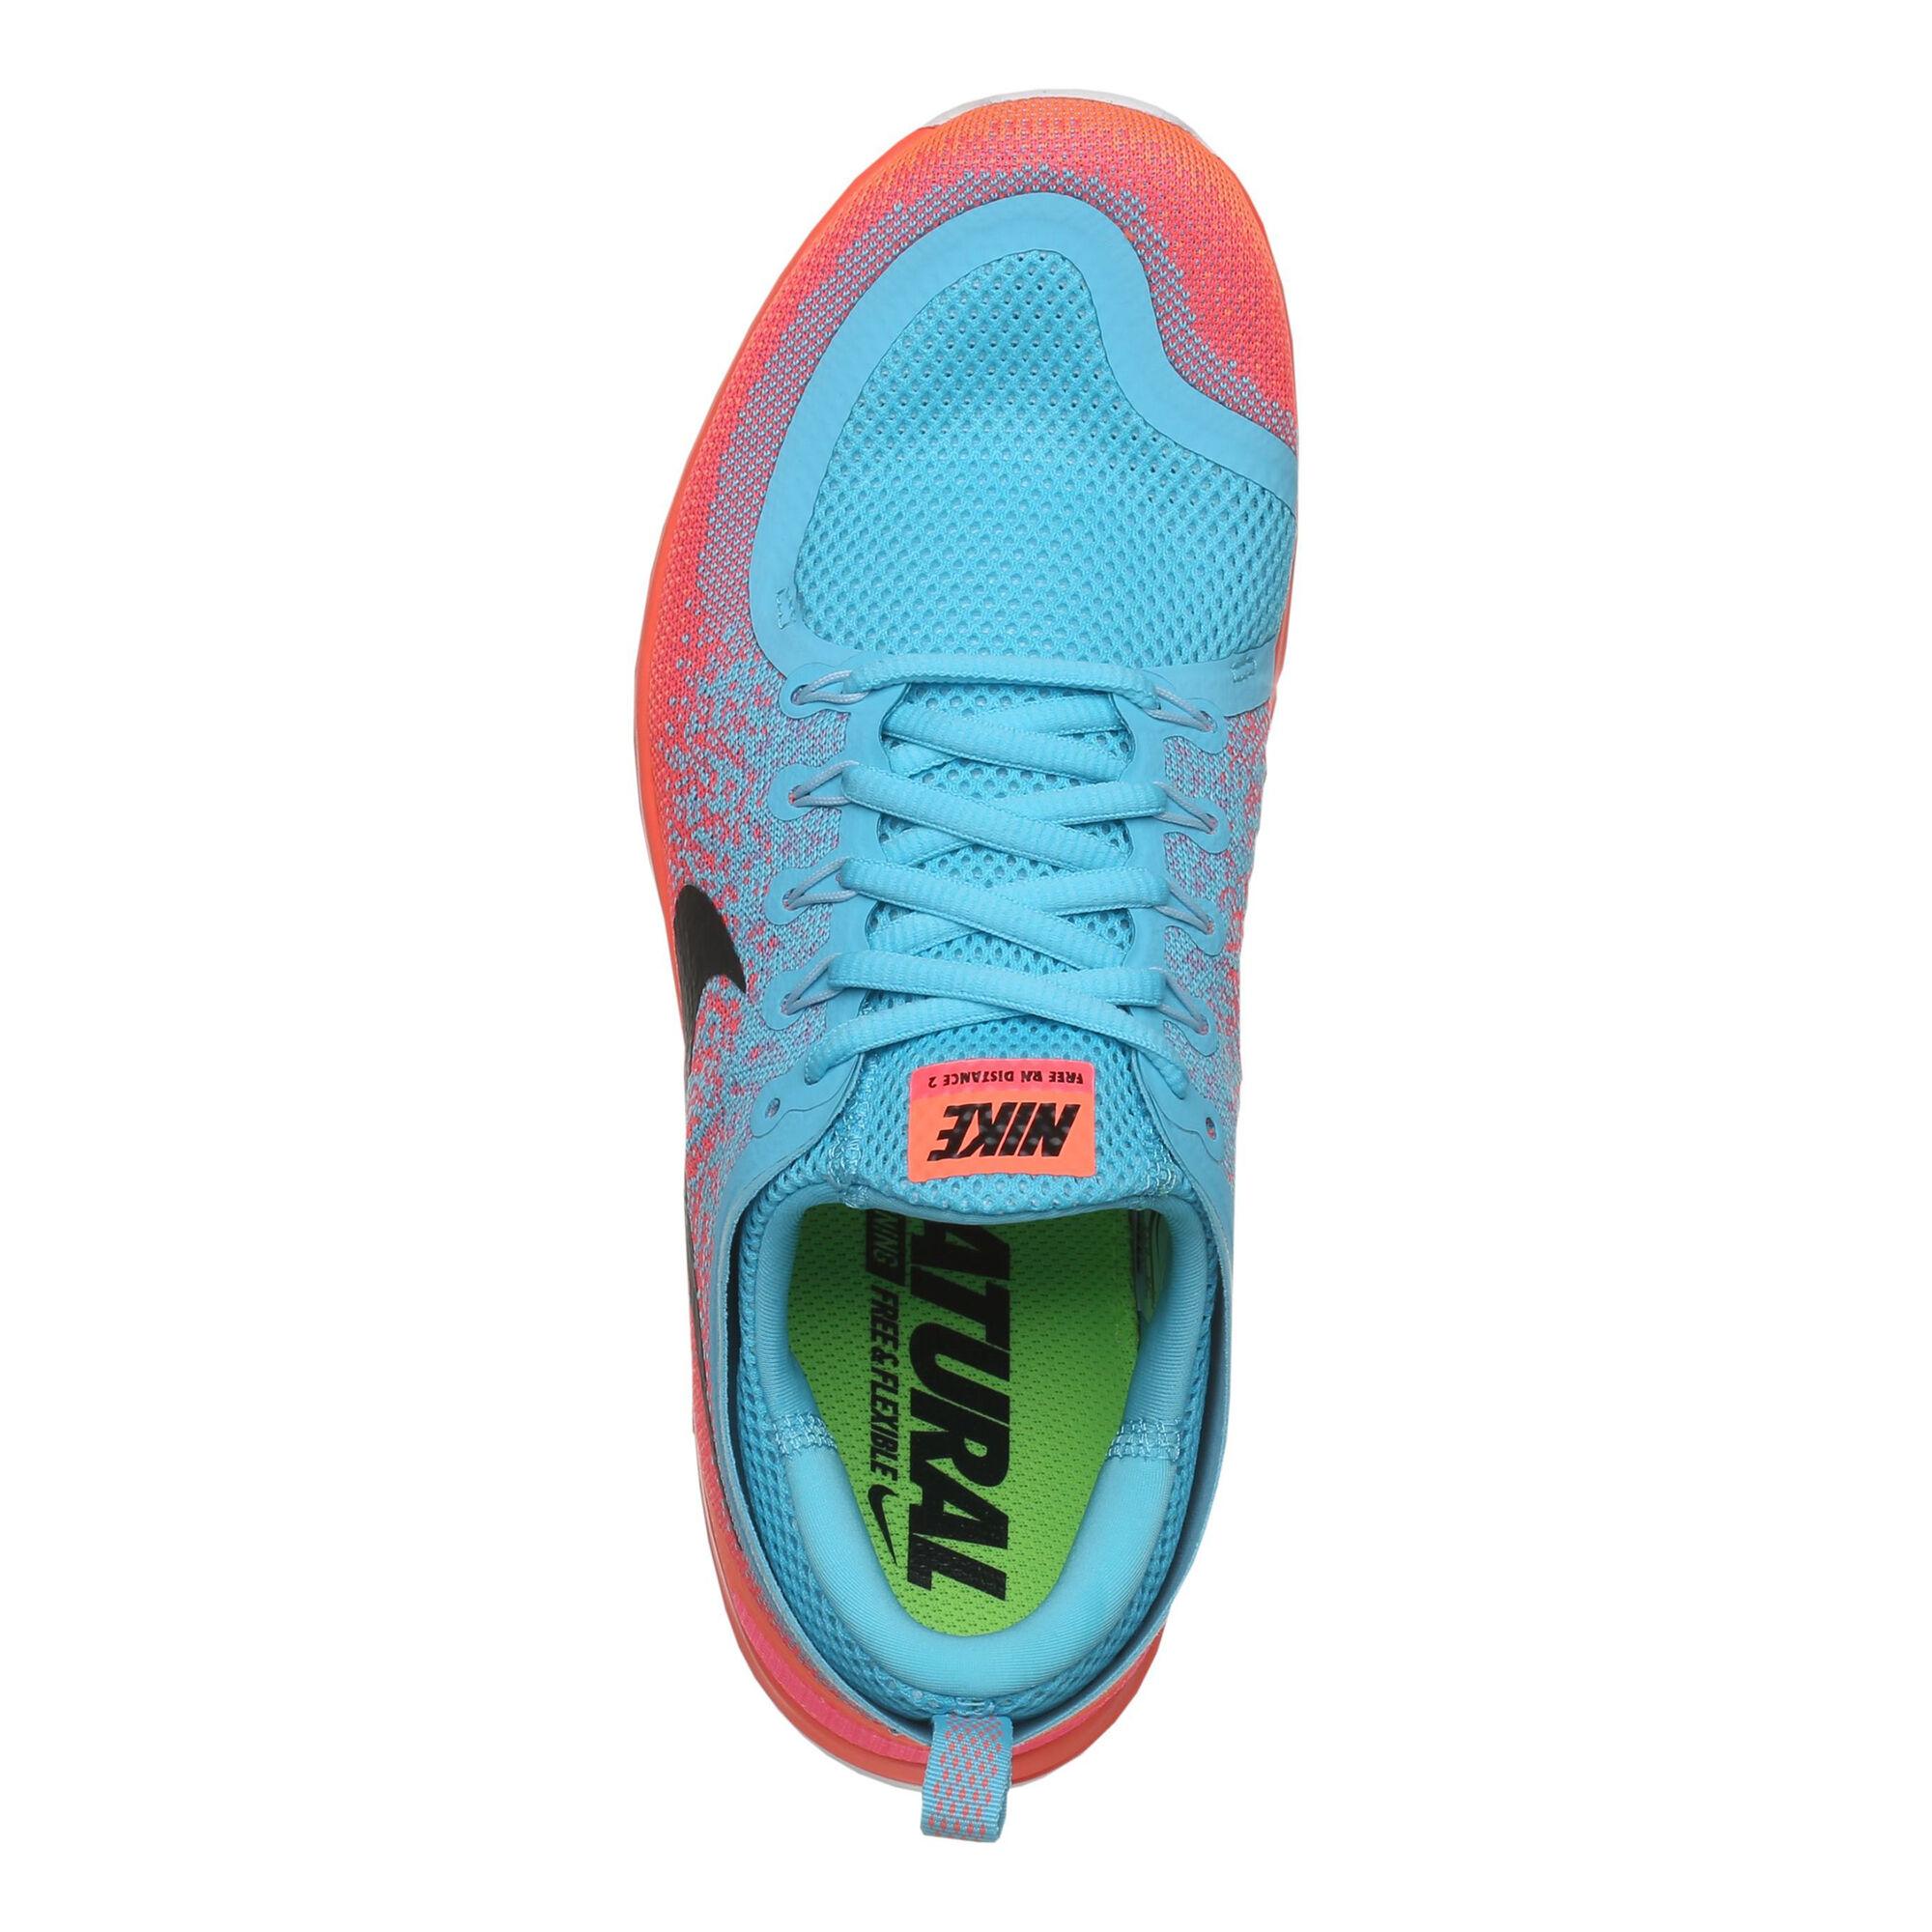 sale retailer 84fe0 cd416 ... Nike · Nike · Nike · Nike · Nike. Free Run Distance 2 Women ...